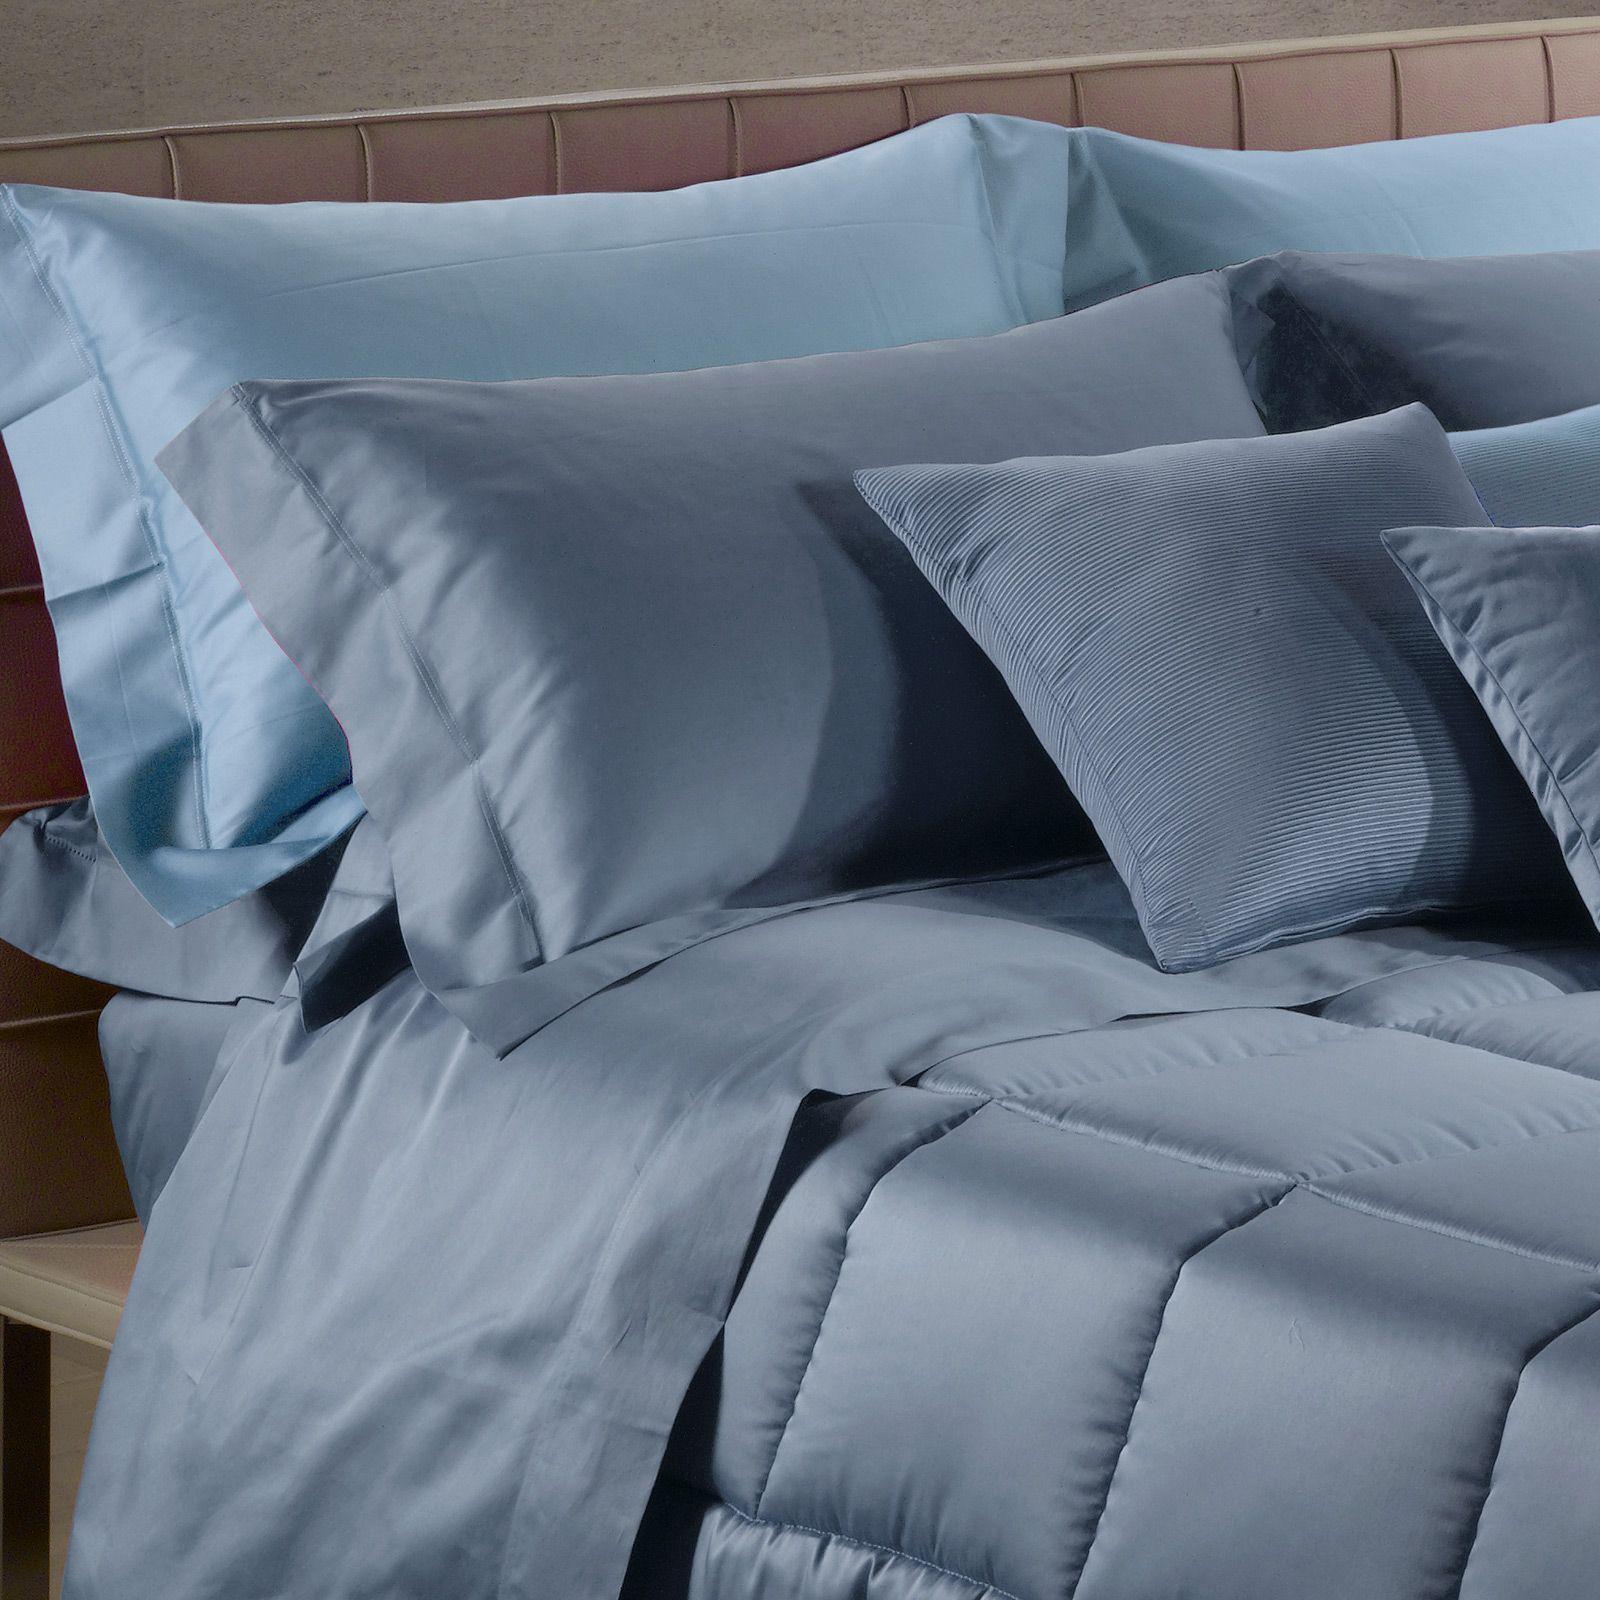 Для сна Наволочки 2шт 70x70 Caleffi Raso Tinta Unito синие komplekt-navolochek-caleffi-raso-tinta-unito-siniy-italiya.jpg